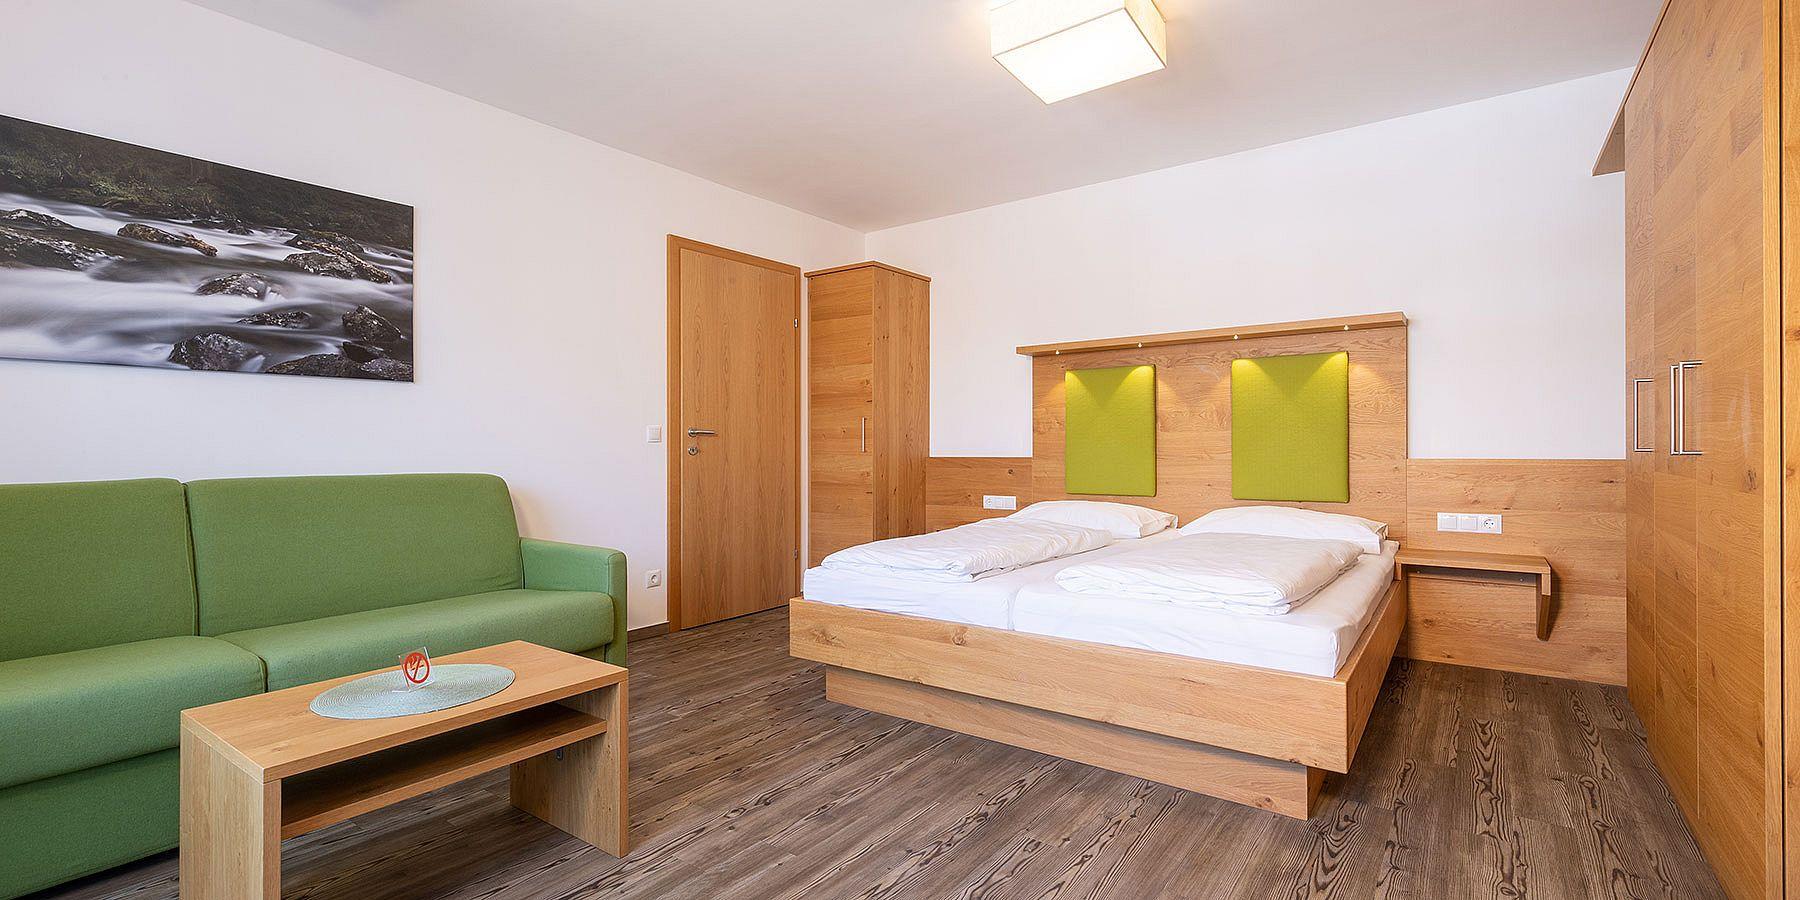 Doppelzimmer Hotel Reiter